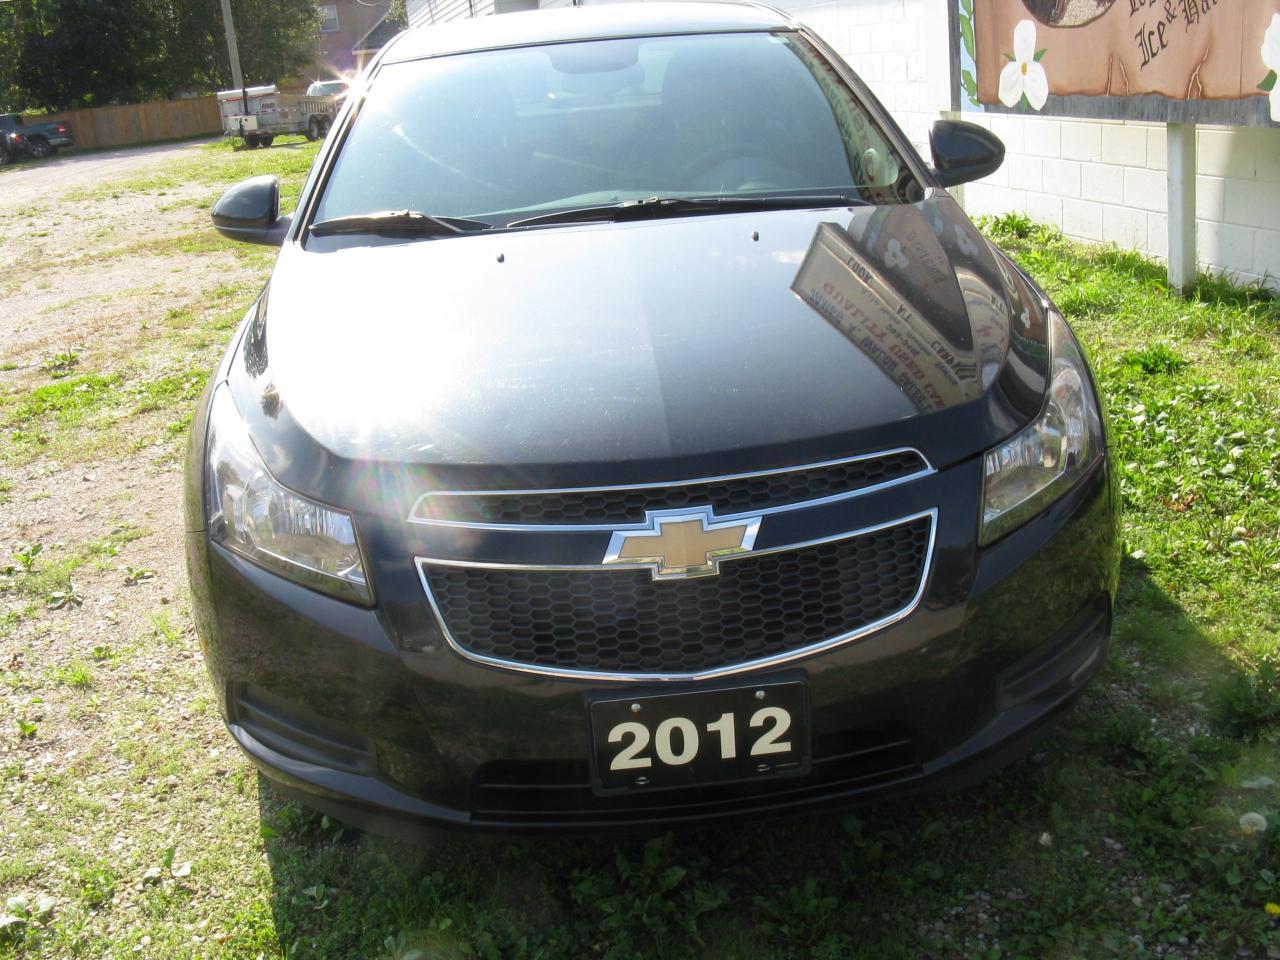 2012 Chevrolet Cruze cloth